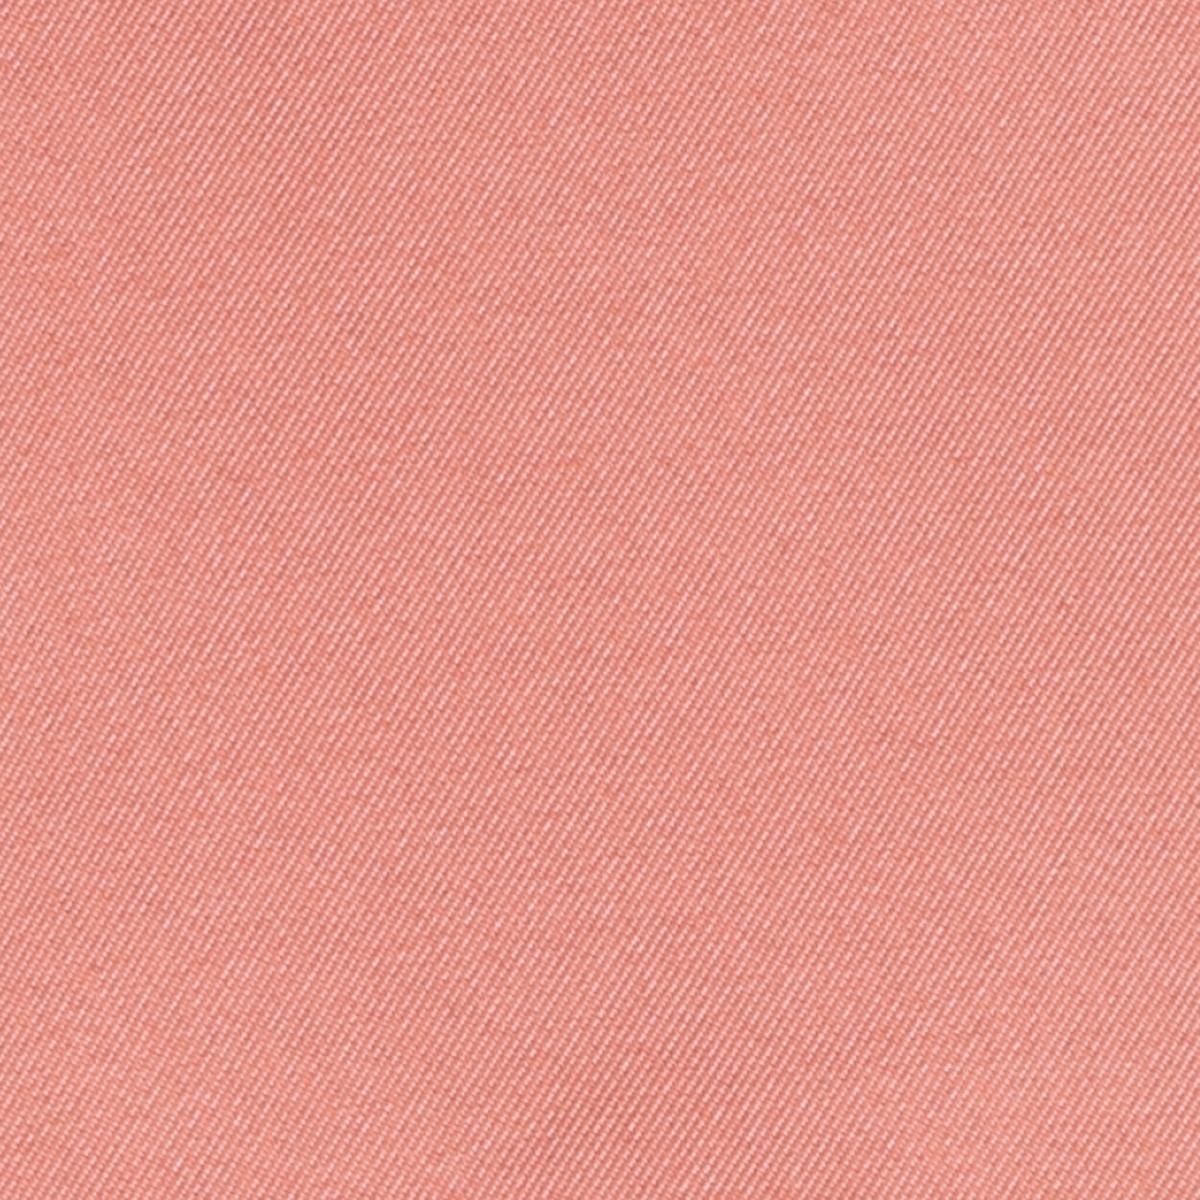 96231-SILLA PASEO JOOLZ AER ABSOLUTE PINK(1-0)-4